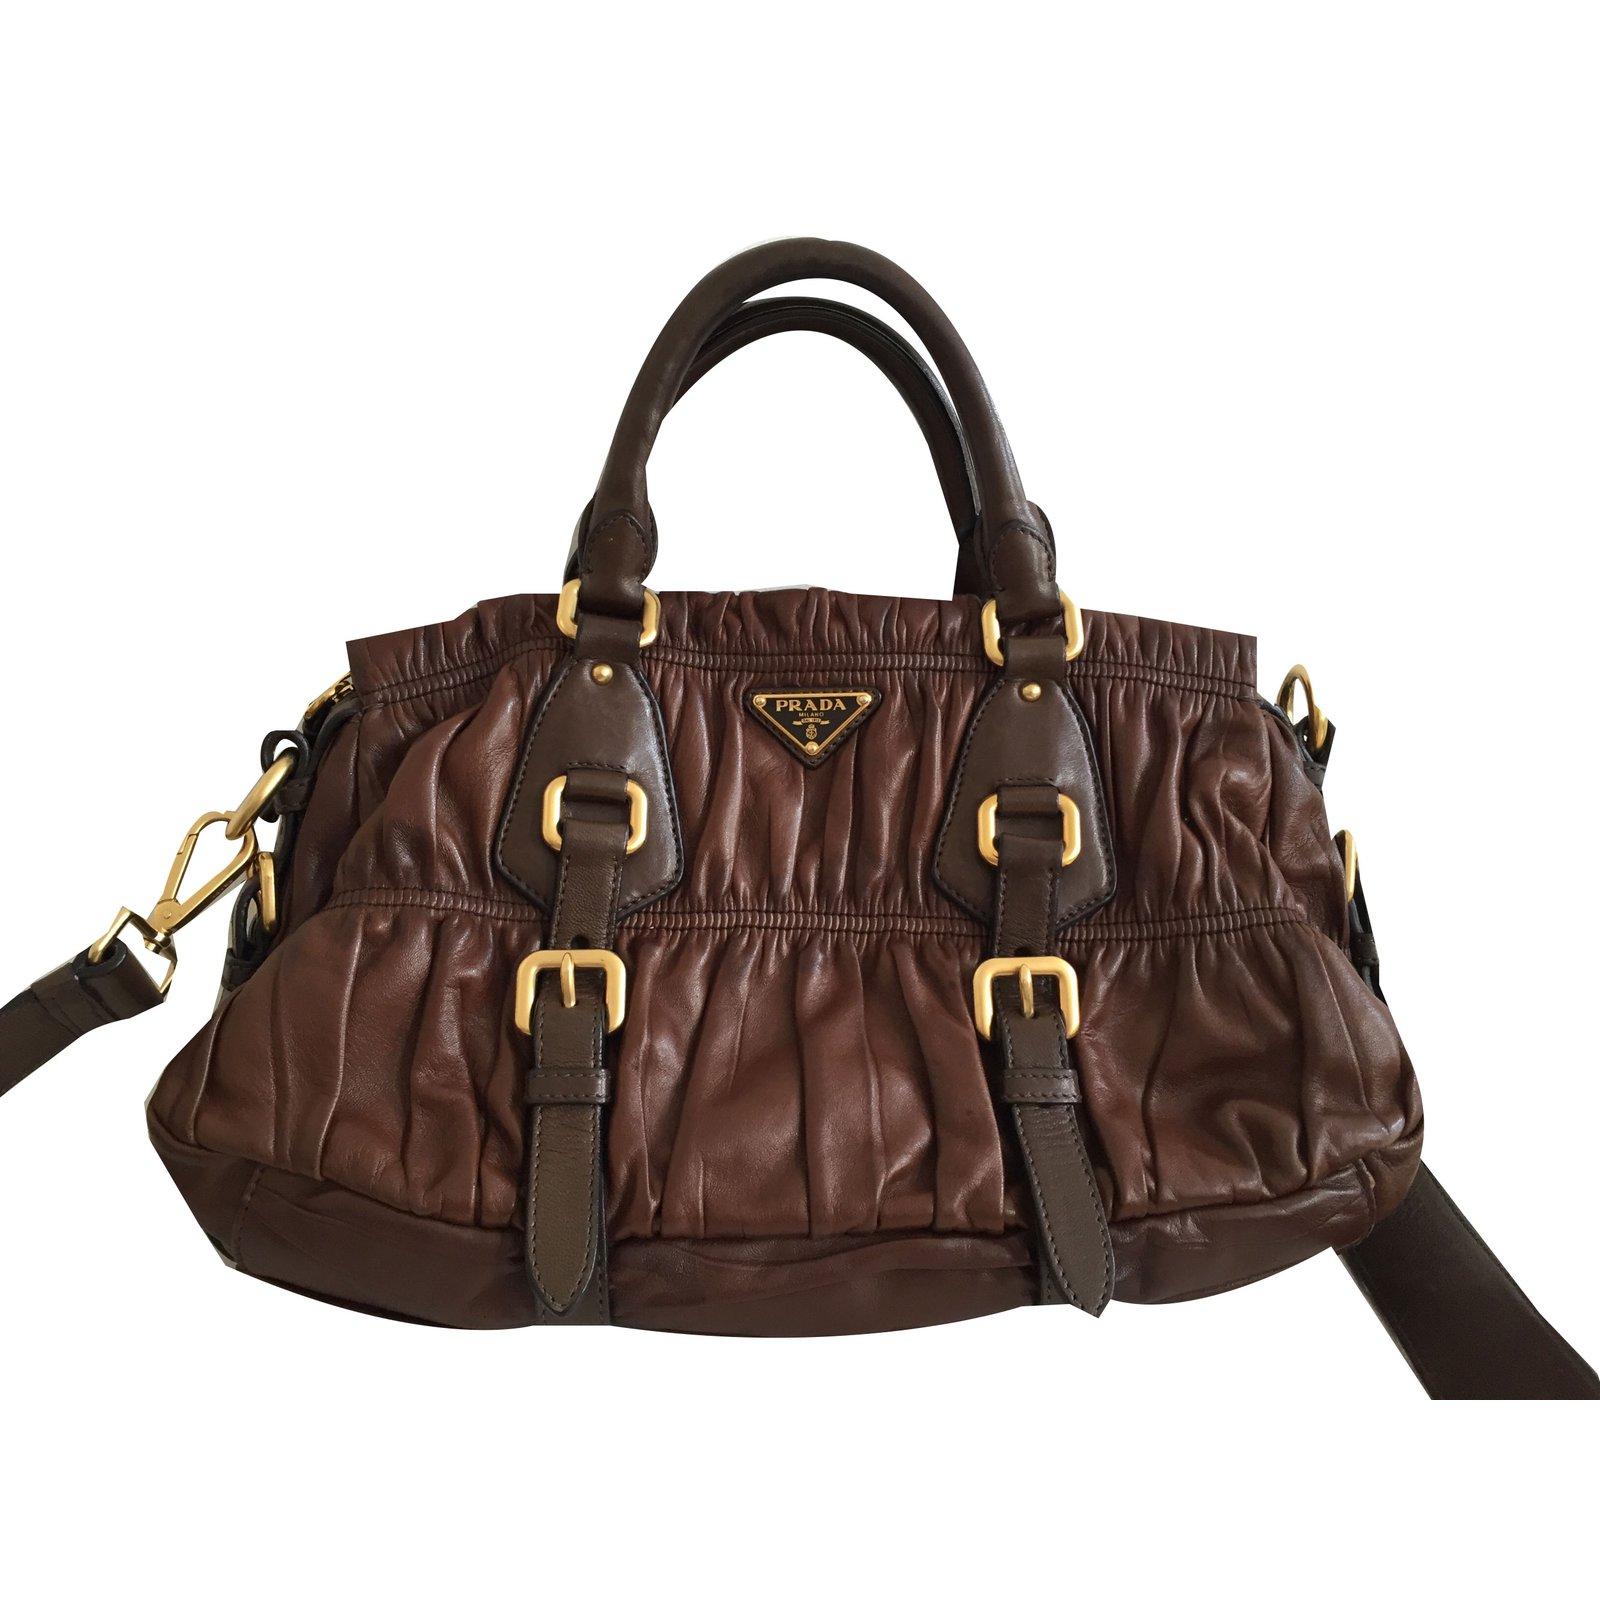 e3f71283 Prada Nappa gauffre bag brown